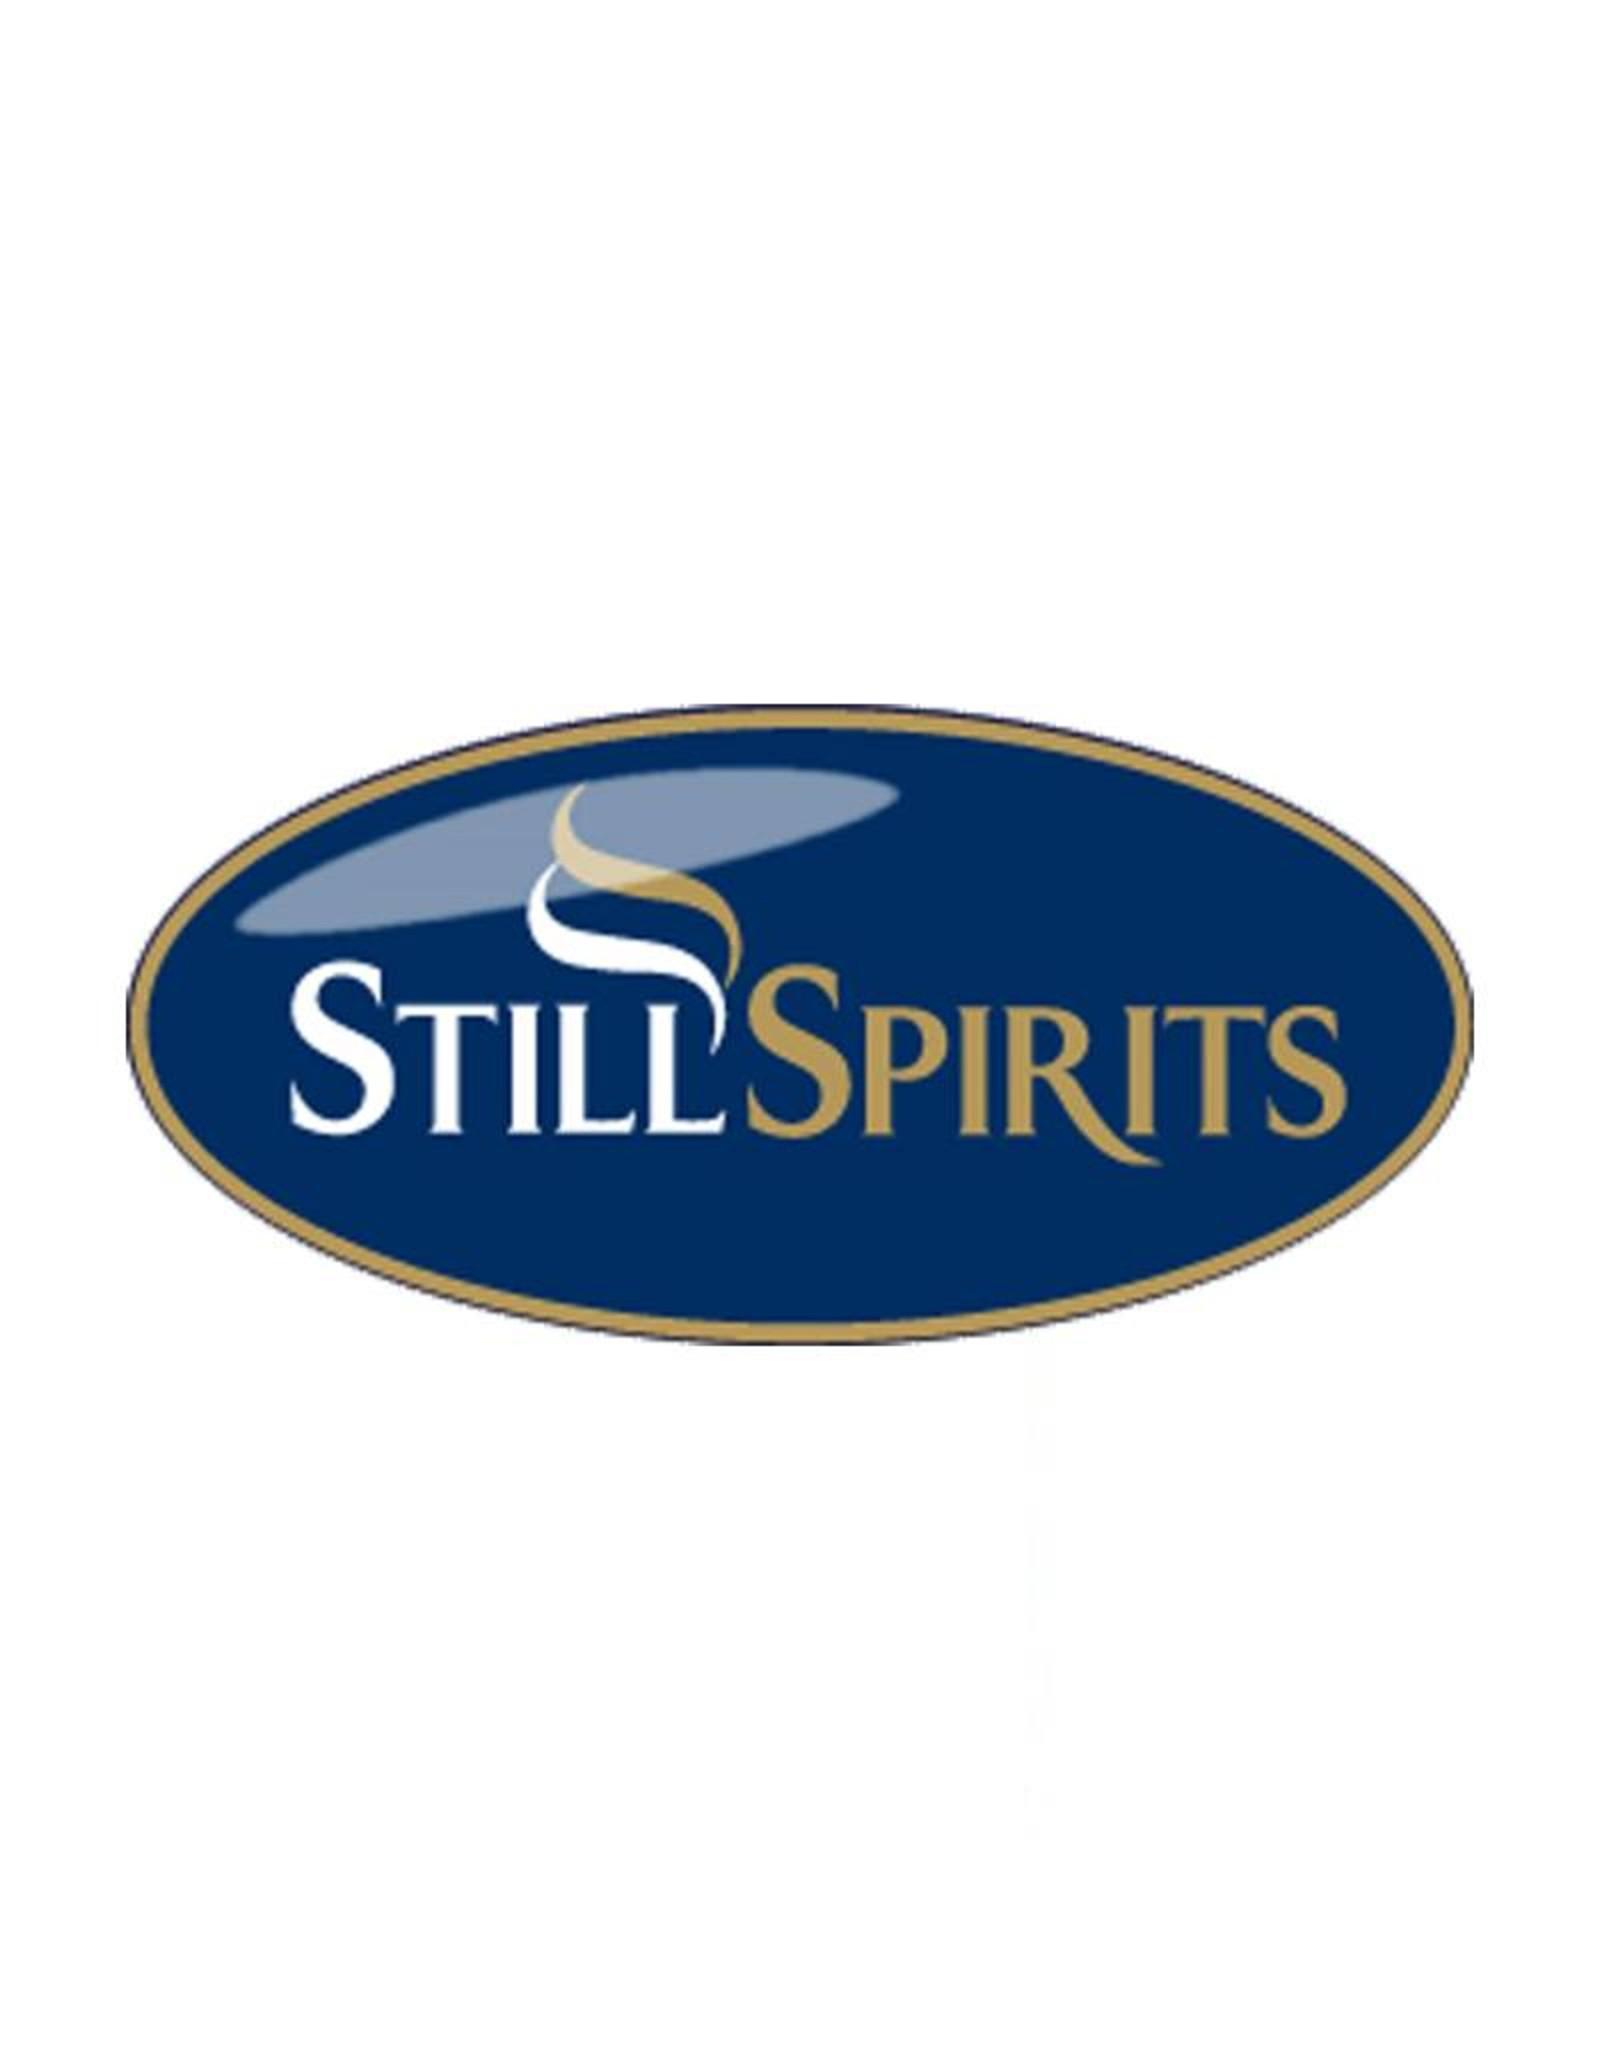 Still Spirits Ceramic Saddles 250g